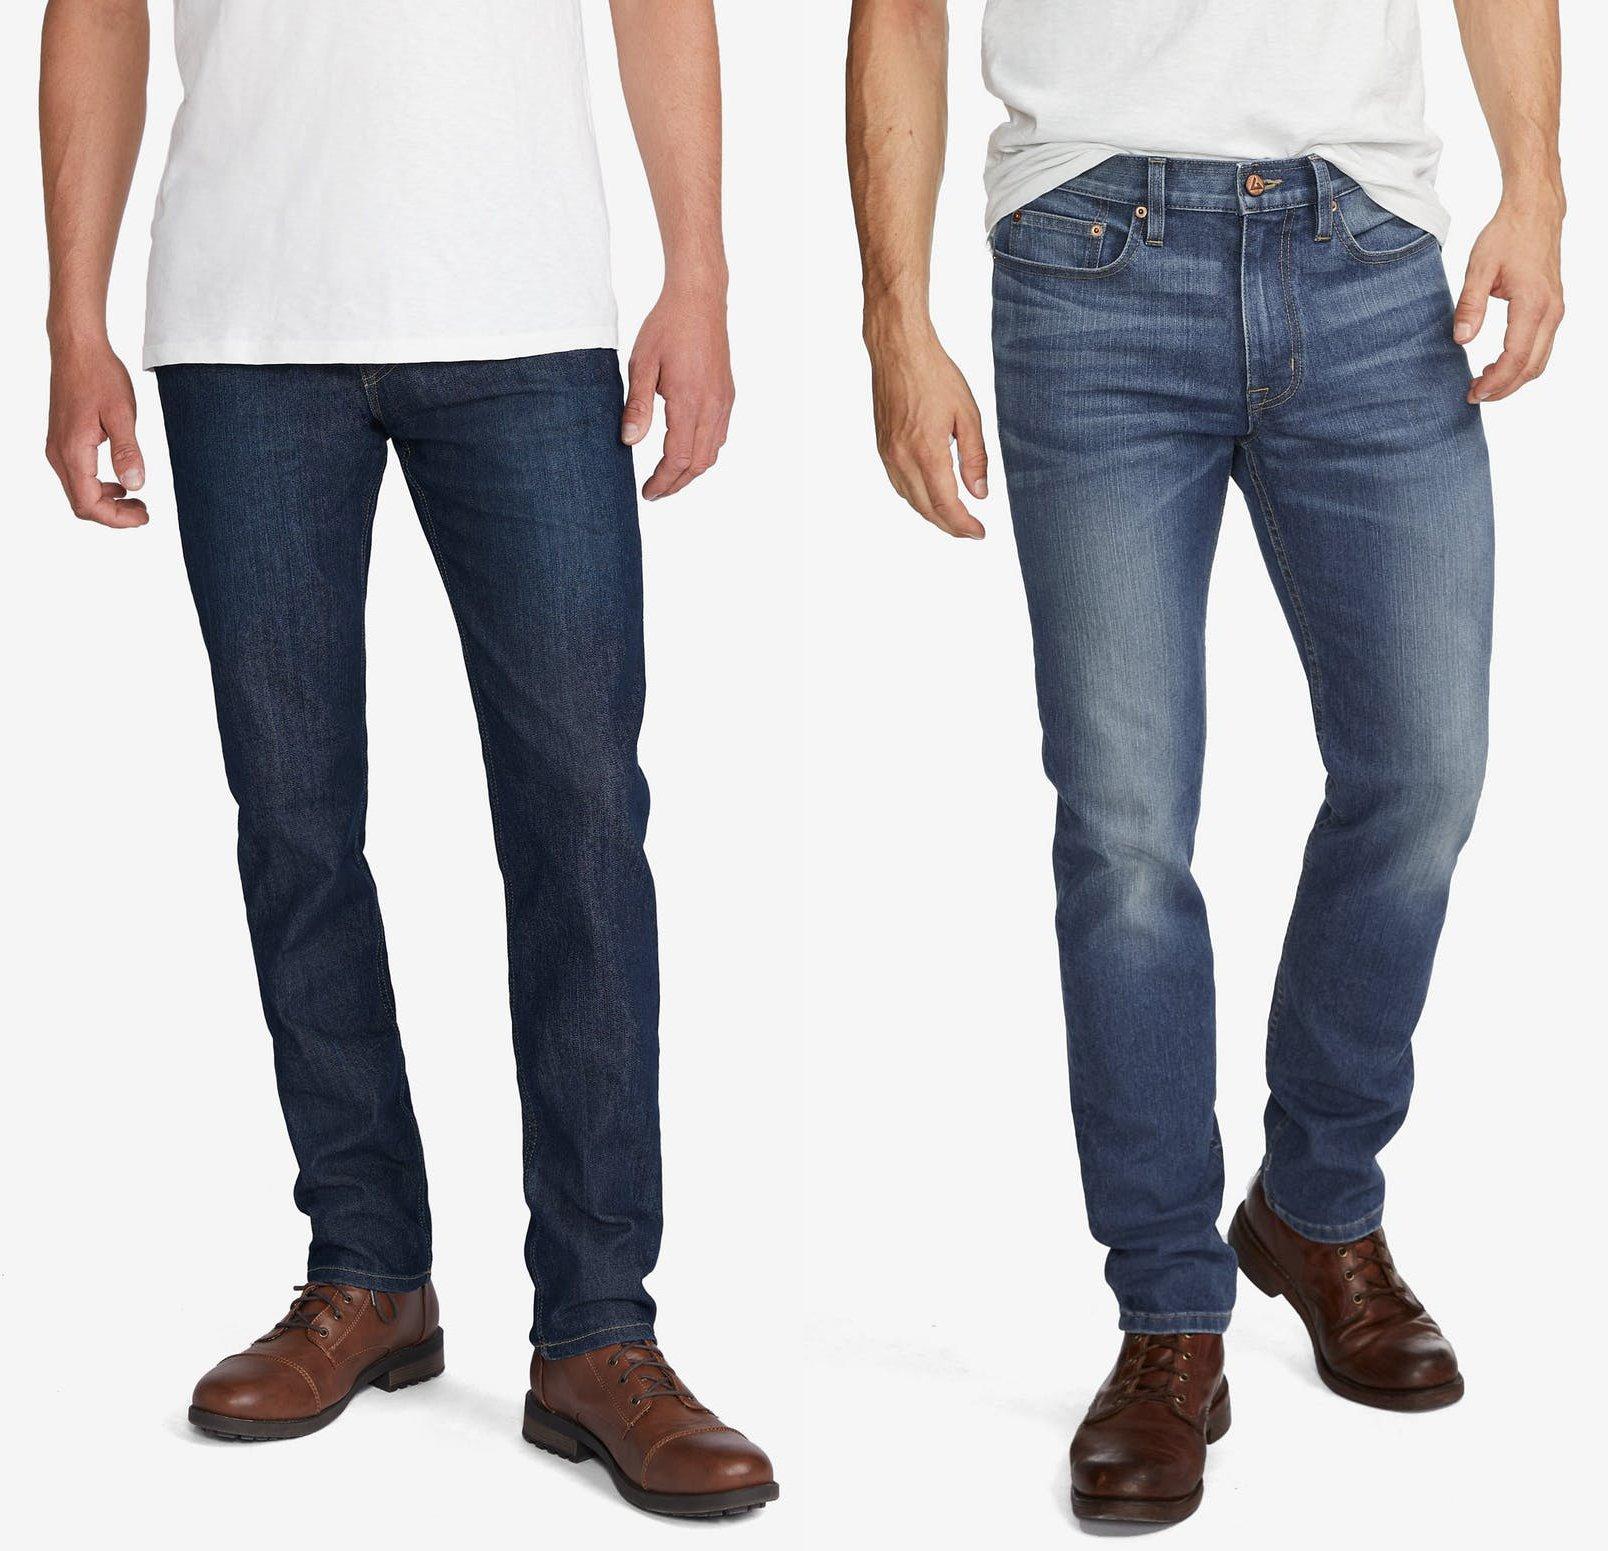 American Giant's Dakota Straight, $138, is a classic pair of straight-leg jeans custom-developed with Mount Vernon denim